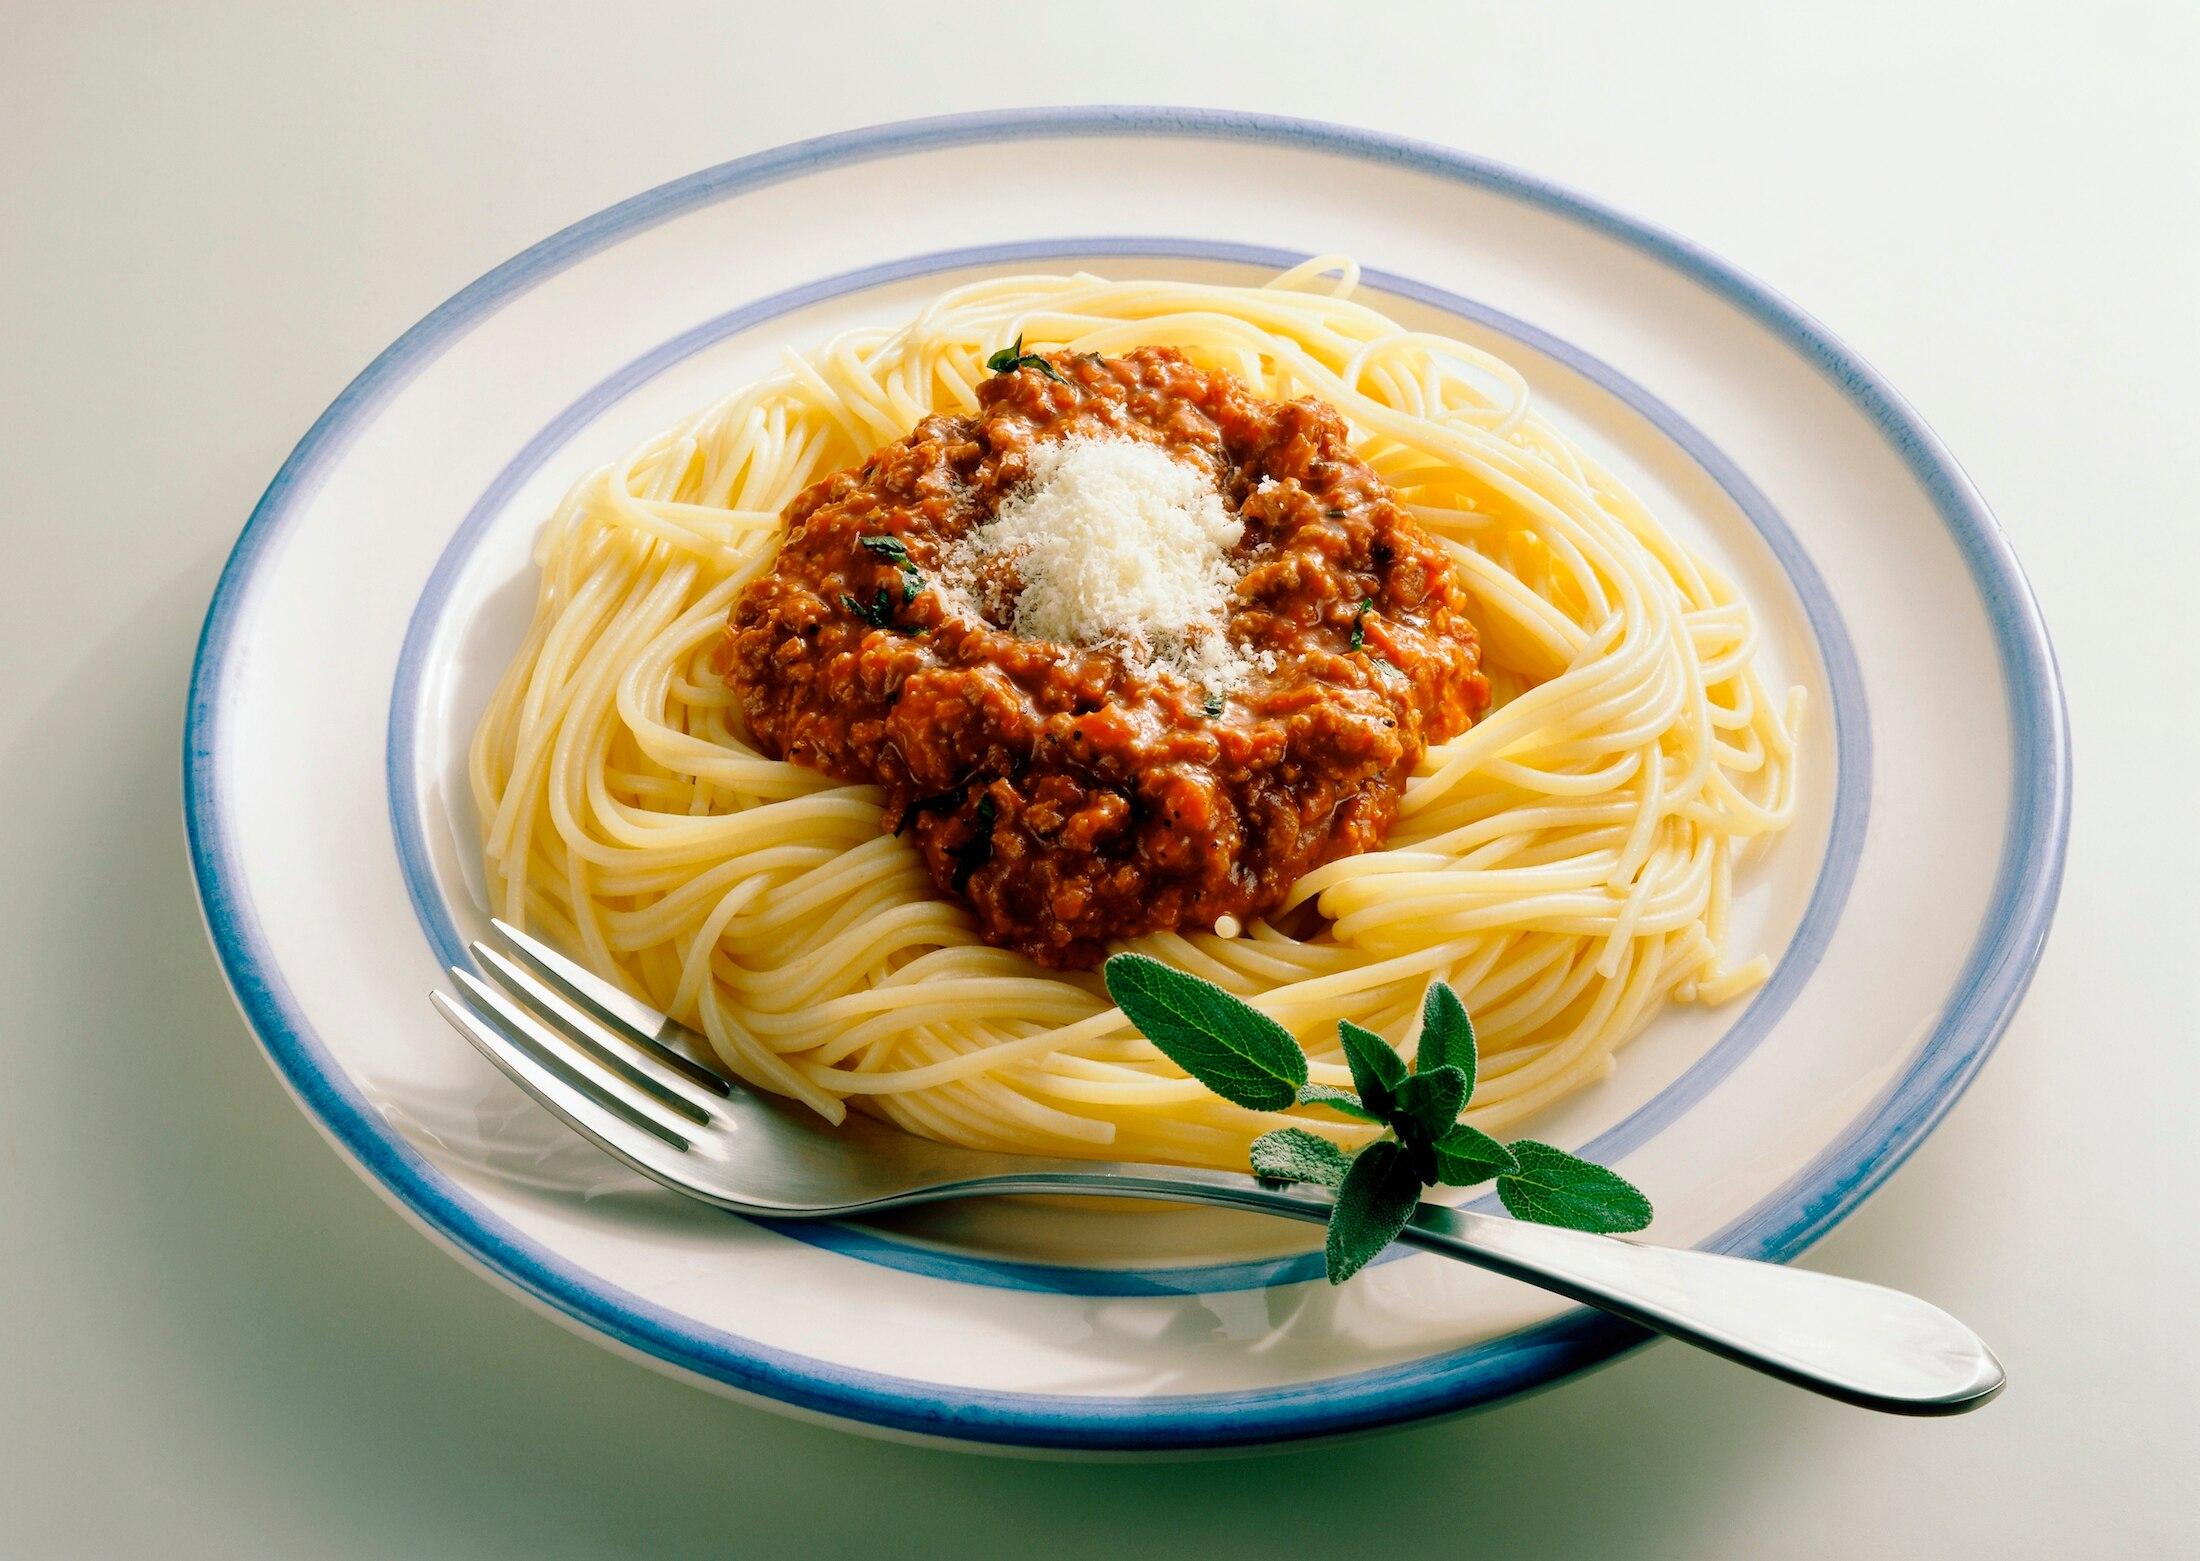 darum essen italiener niemals spaghetti bolognese mit originalrezept travelbook. Black Bedroom Furniture Sets. Home Design Ideas